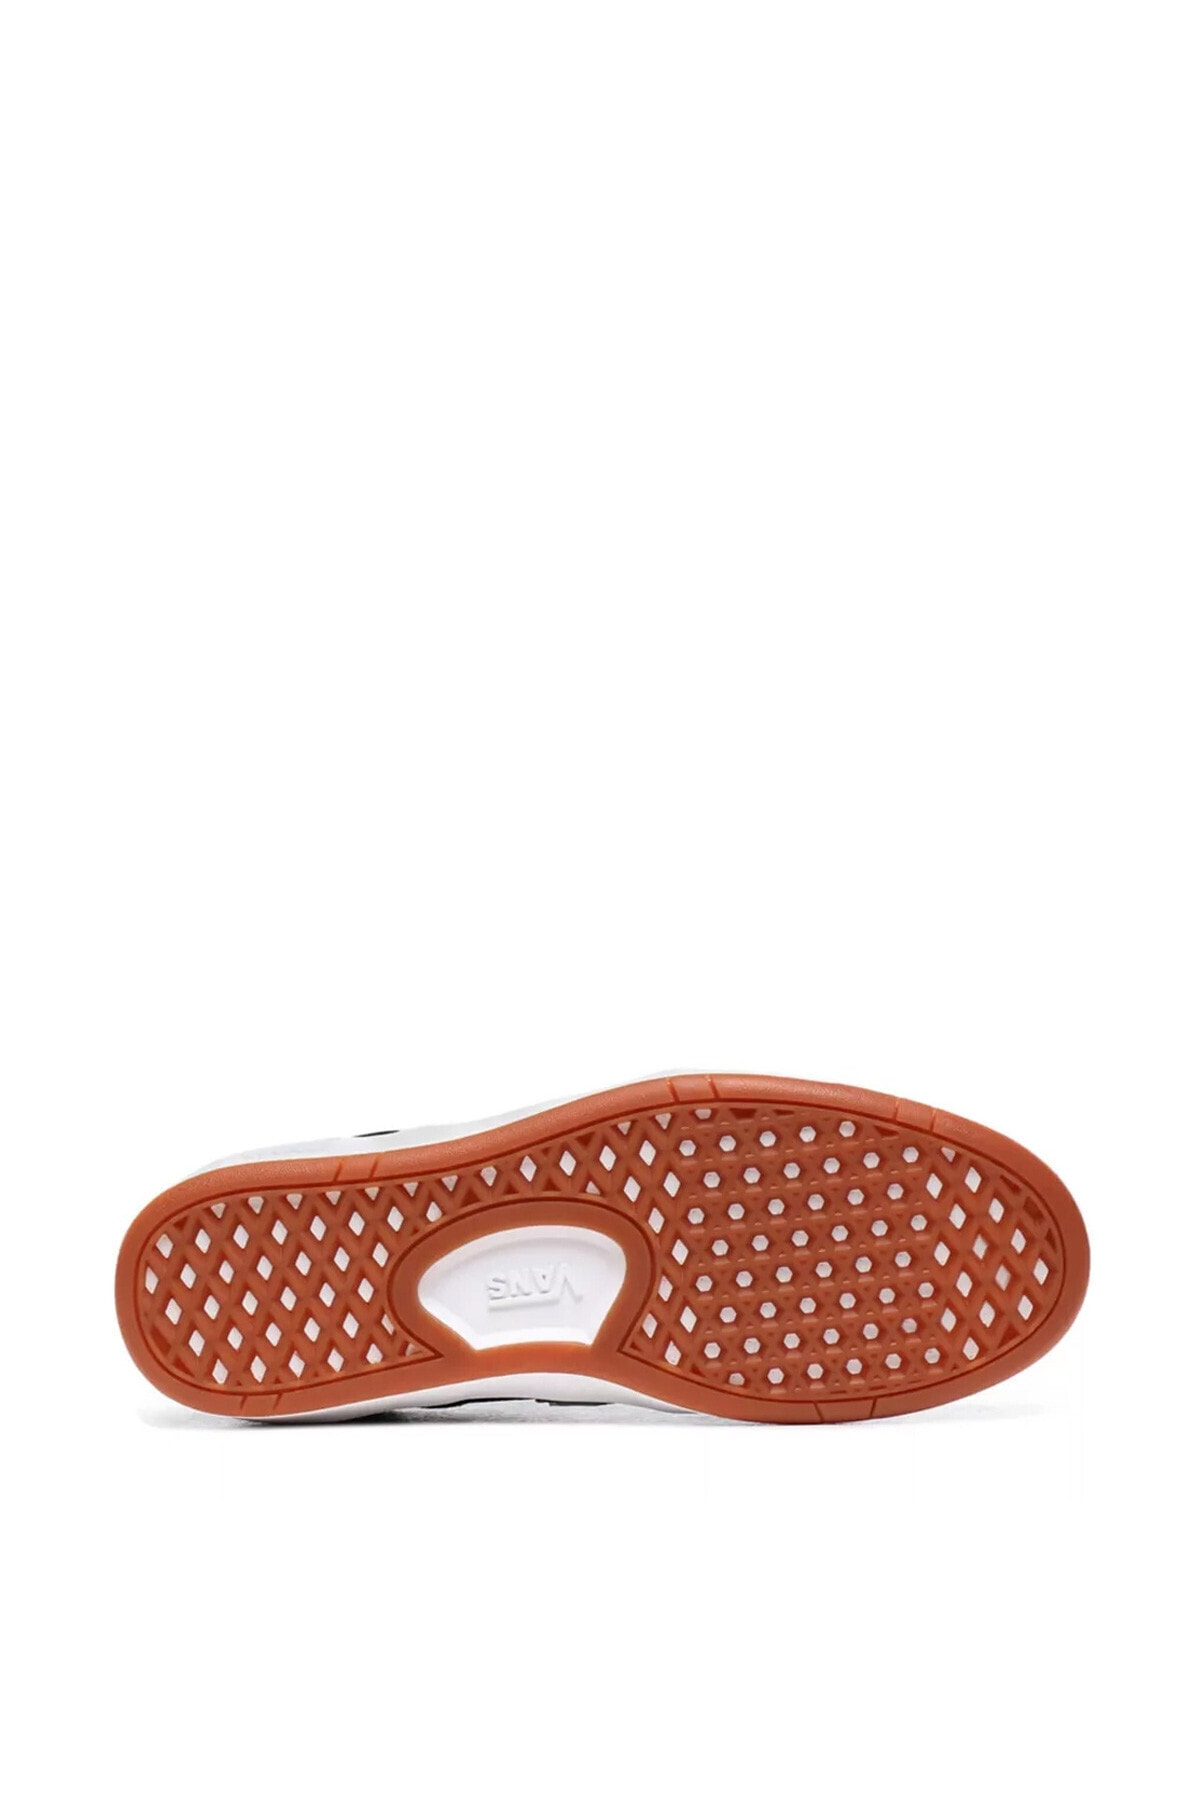 Vans Staple Lowland Comfycush Erkek Ayakkabısı Vn0a4tzyos71 2